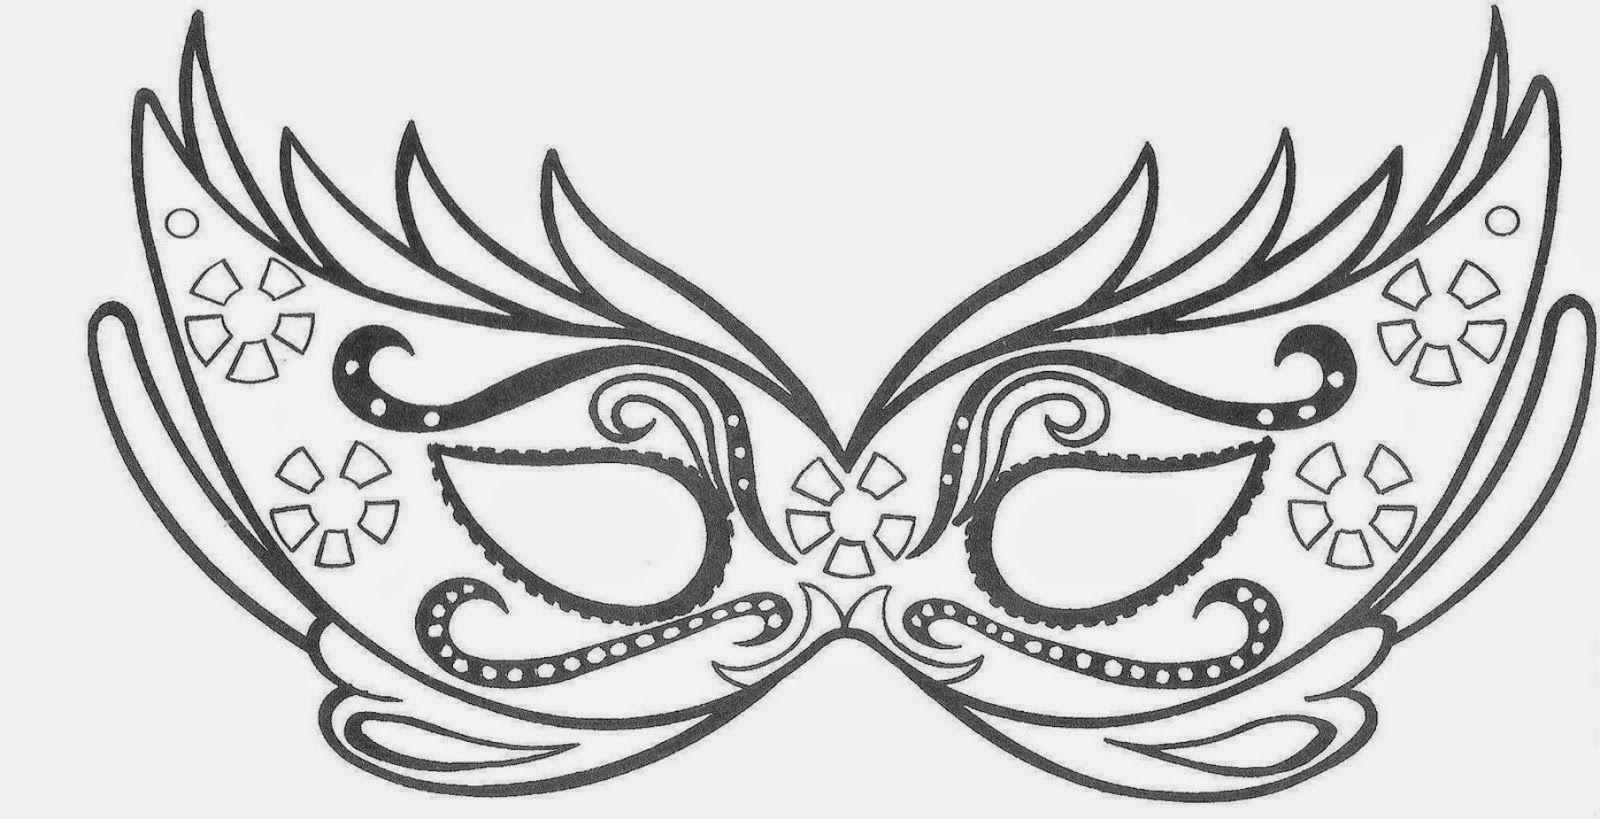 Maschere Di Carnevale Maschere Di Carnevale Da Colorare Didattica Scuola Primaria Maschere Halloween Maschere Disegni Da Colorare